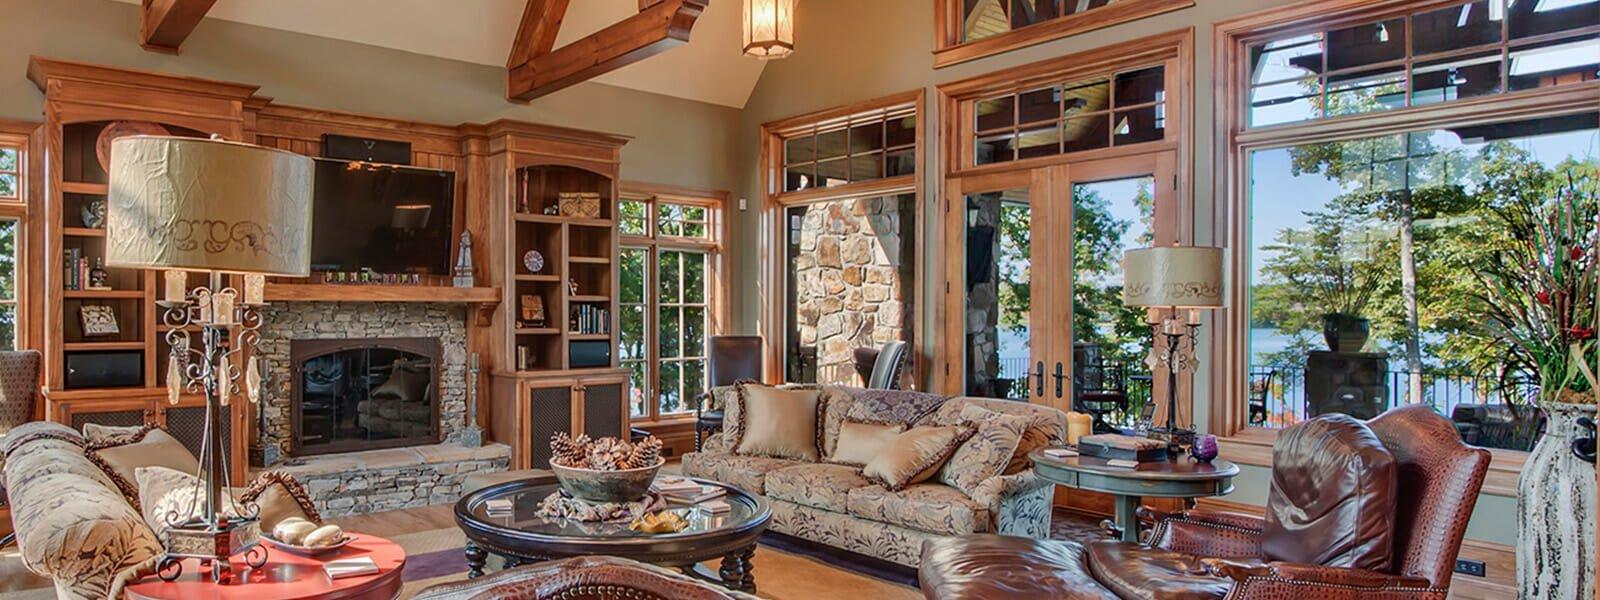 WindRiver   Gated Golf Luxury Community near Knoxville TN   Tellico Lake